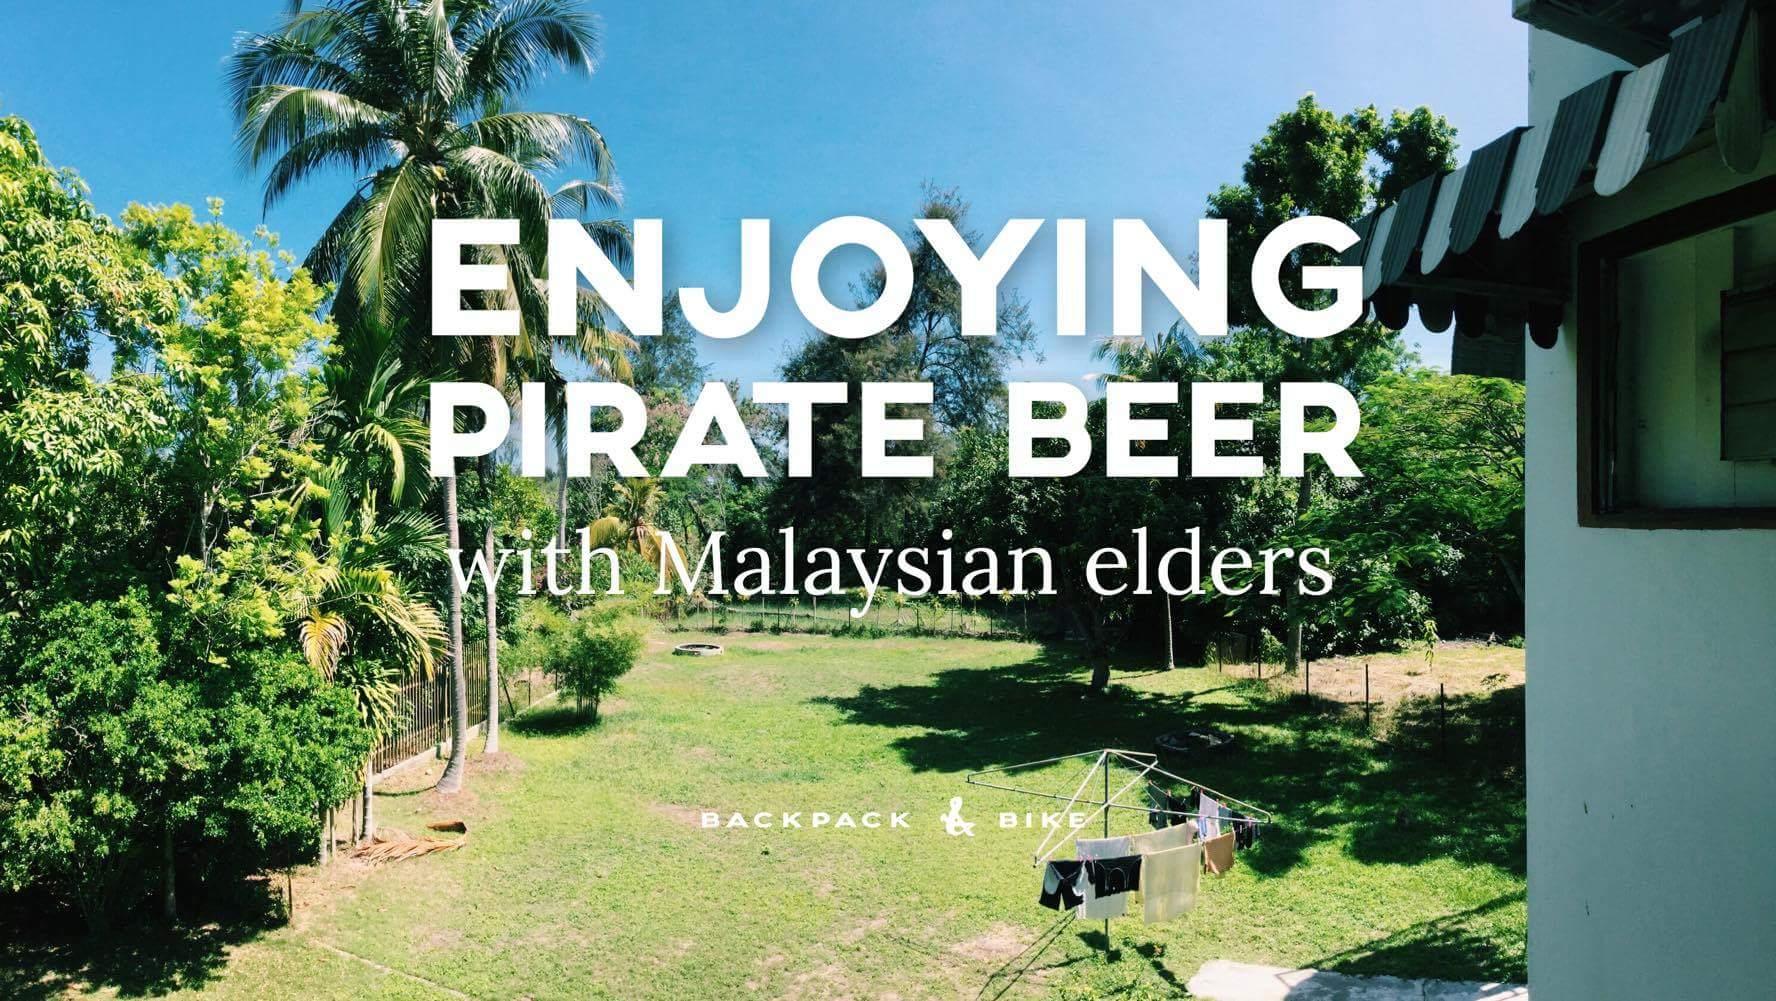 Enjoying Pirate Beer with Malaysian elders